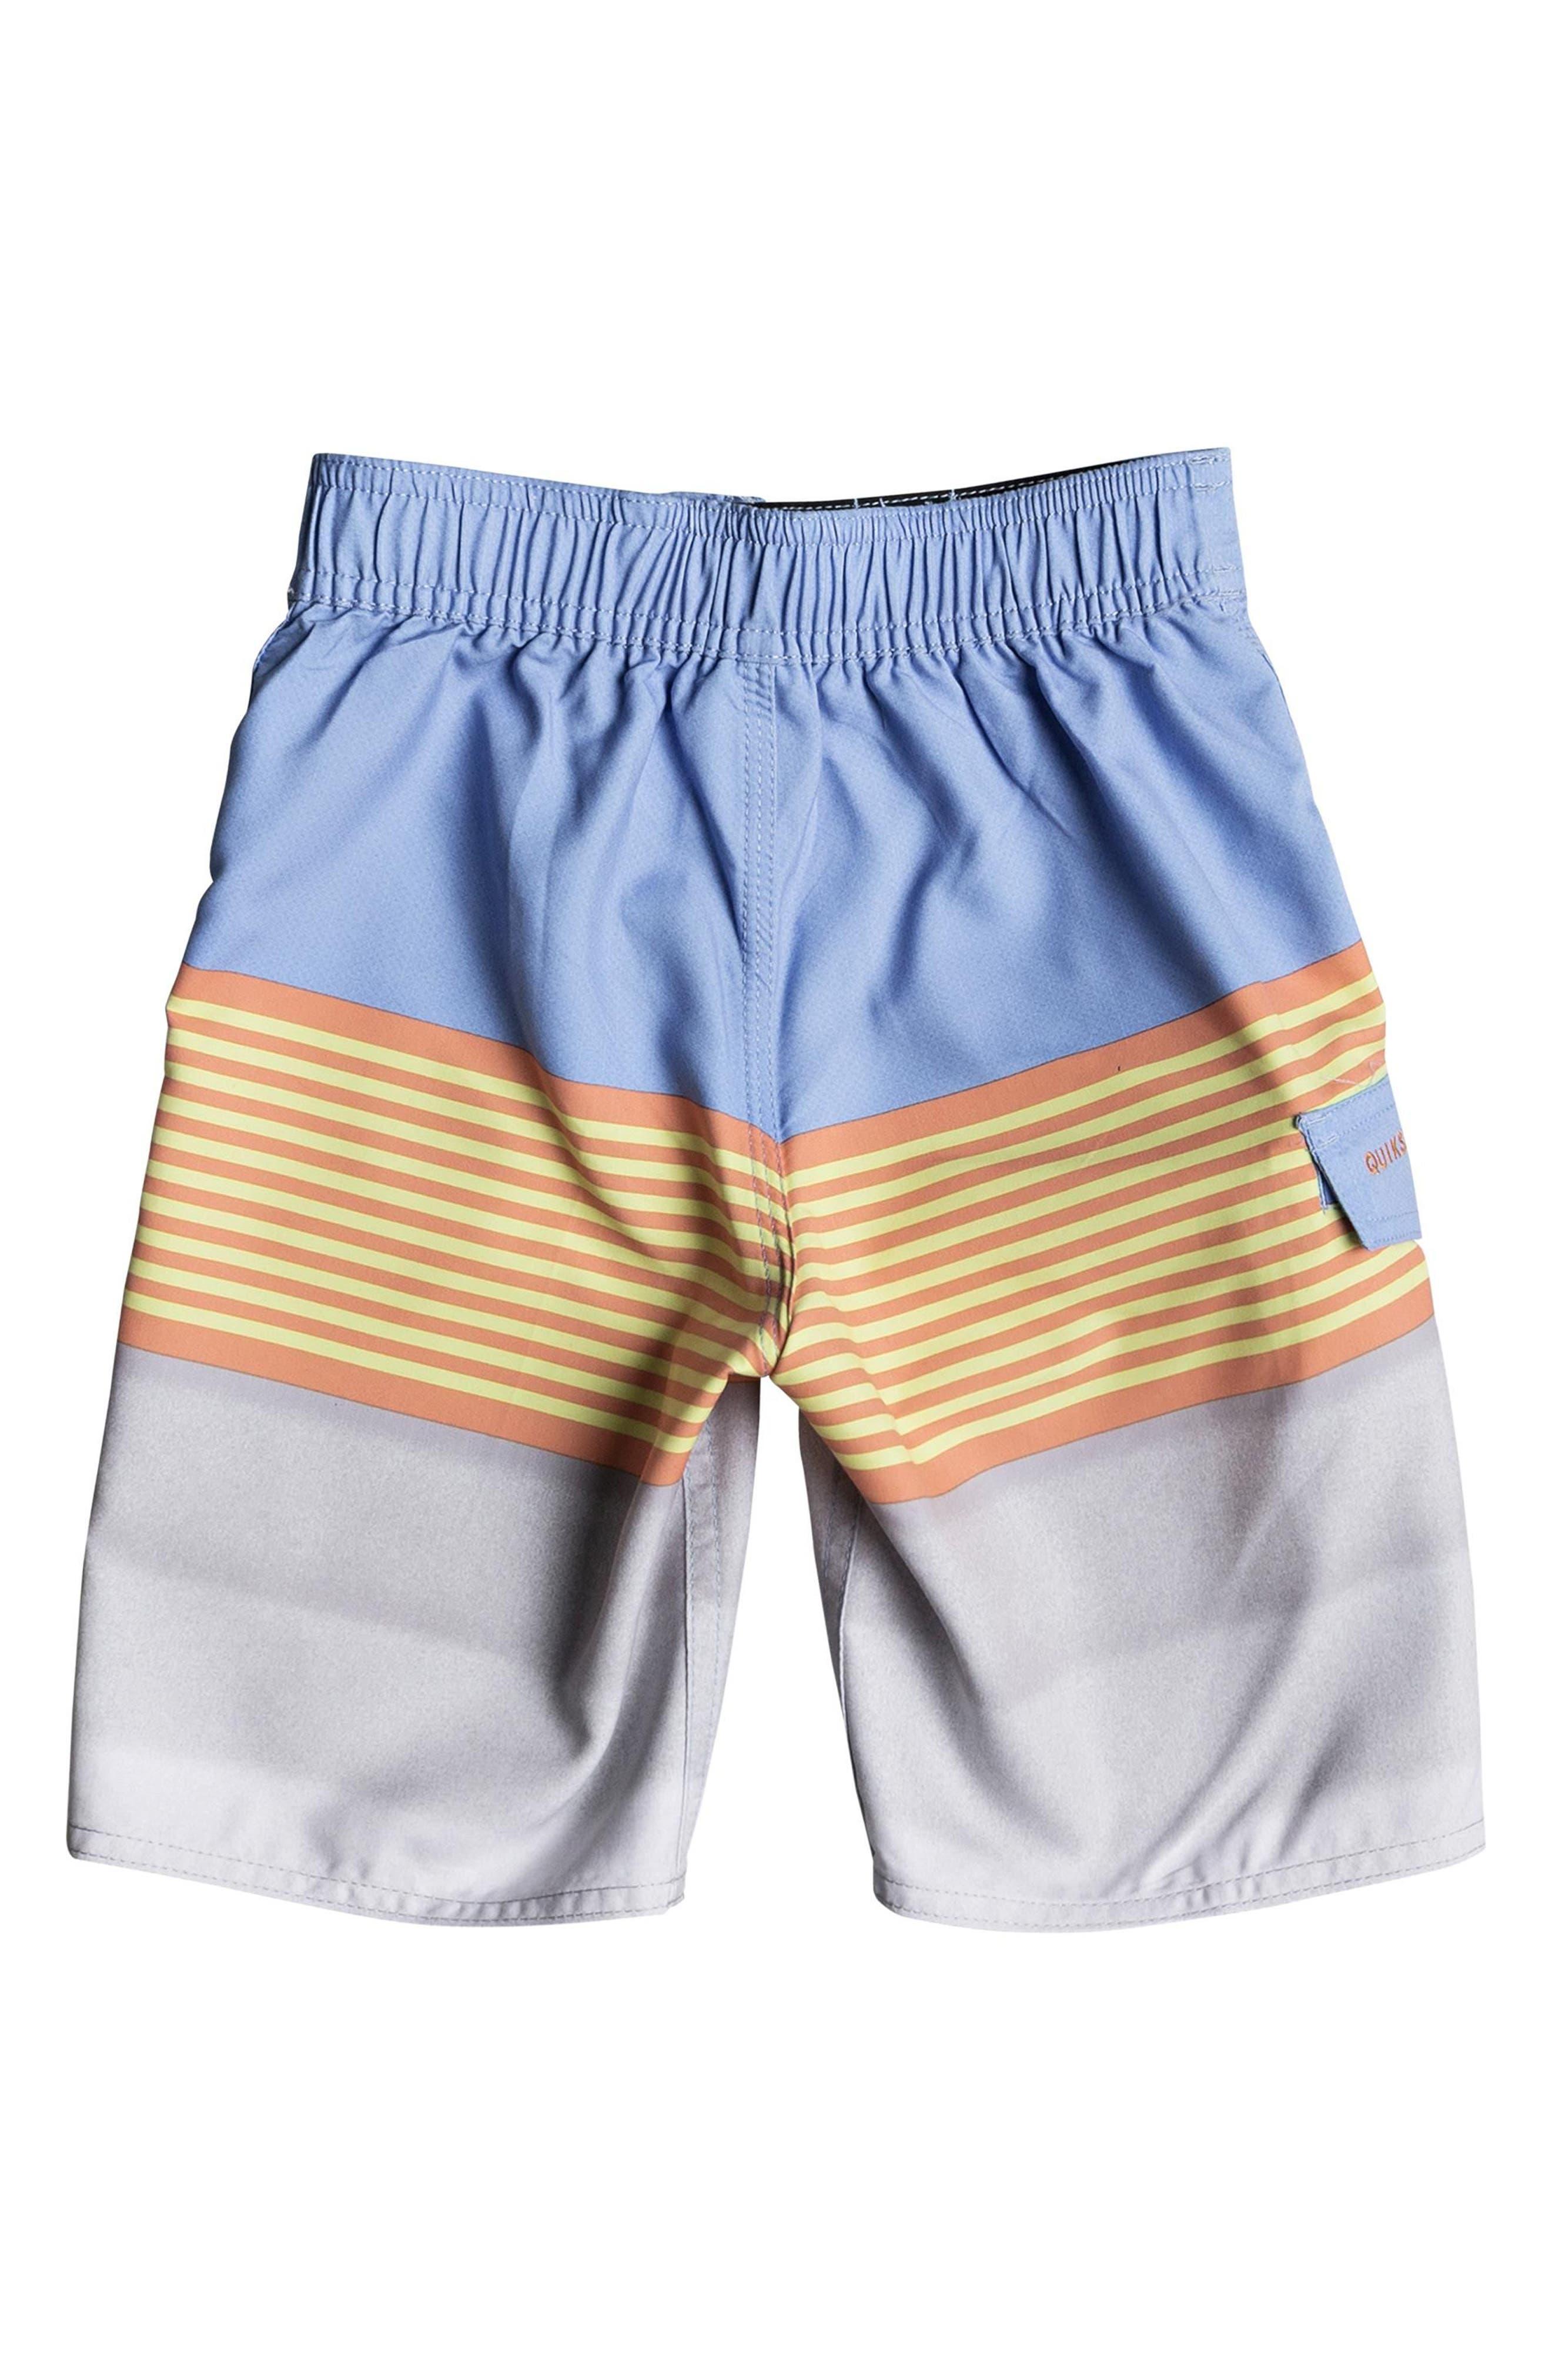 Division Board Shorts,                             Alternate thumbnail 2, color,                             425